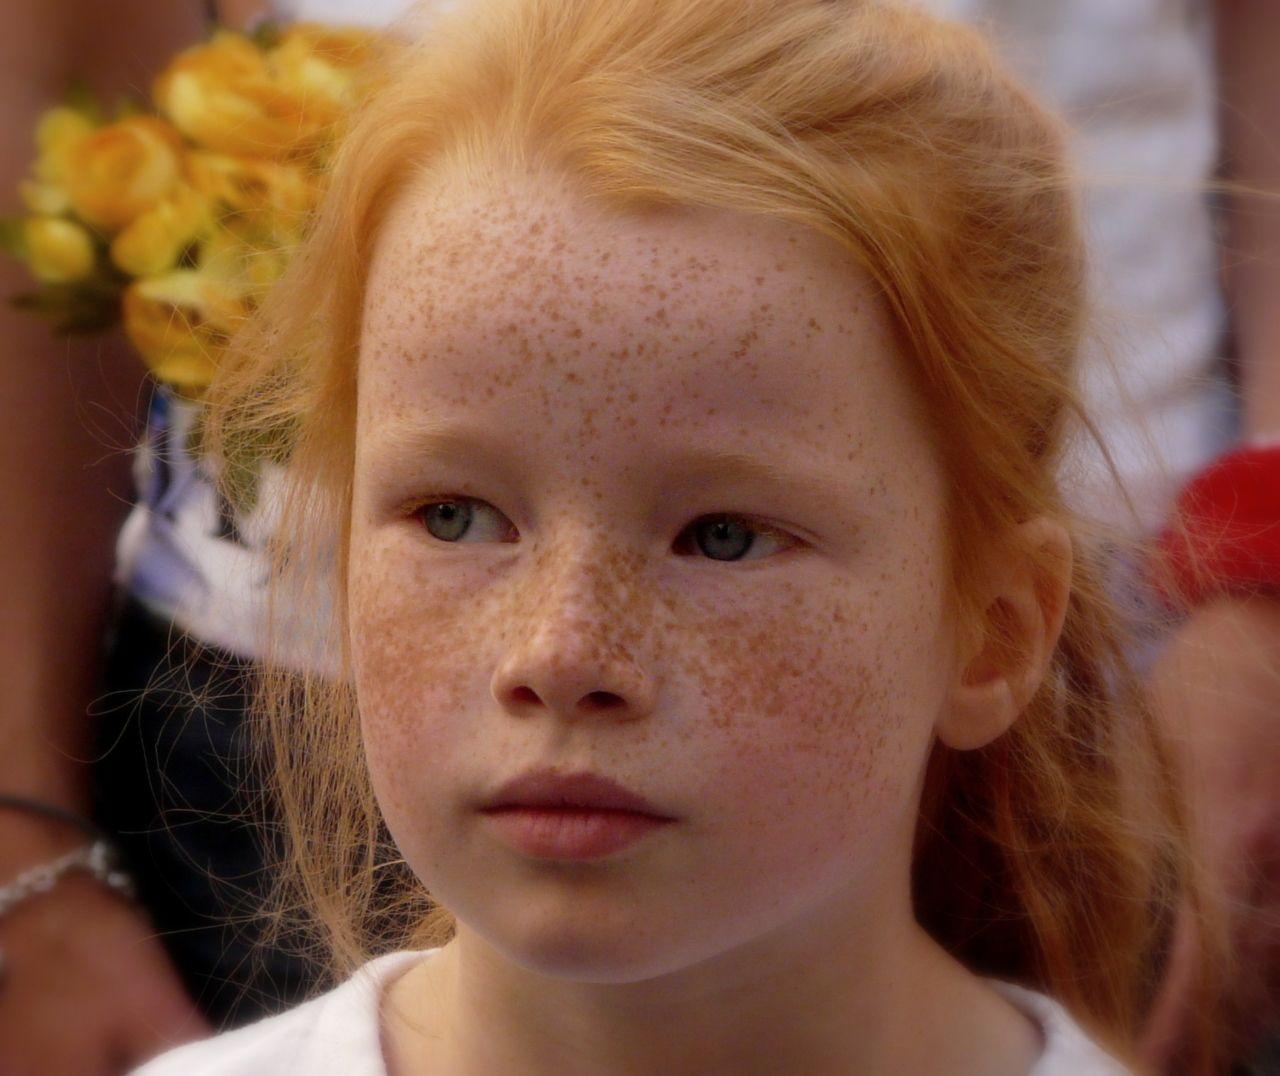 Chubby freckles yvonne